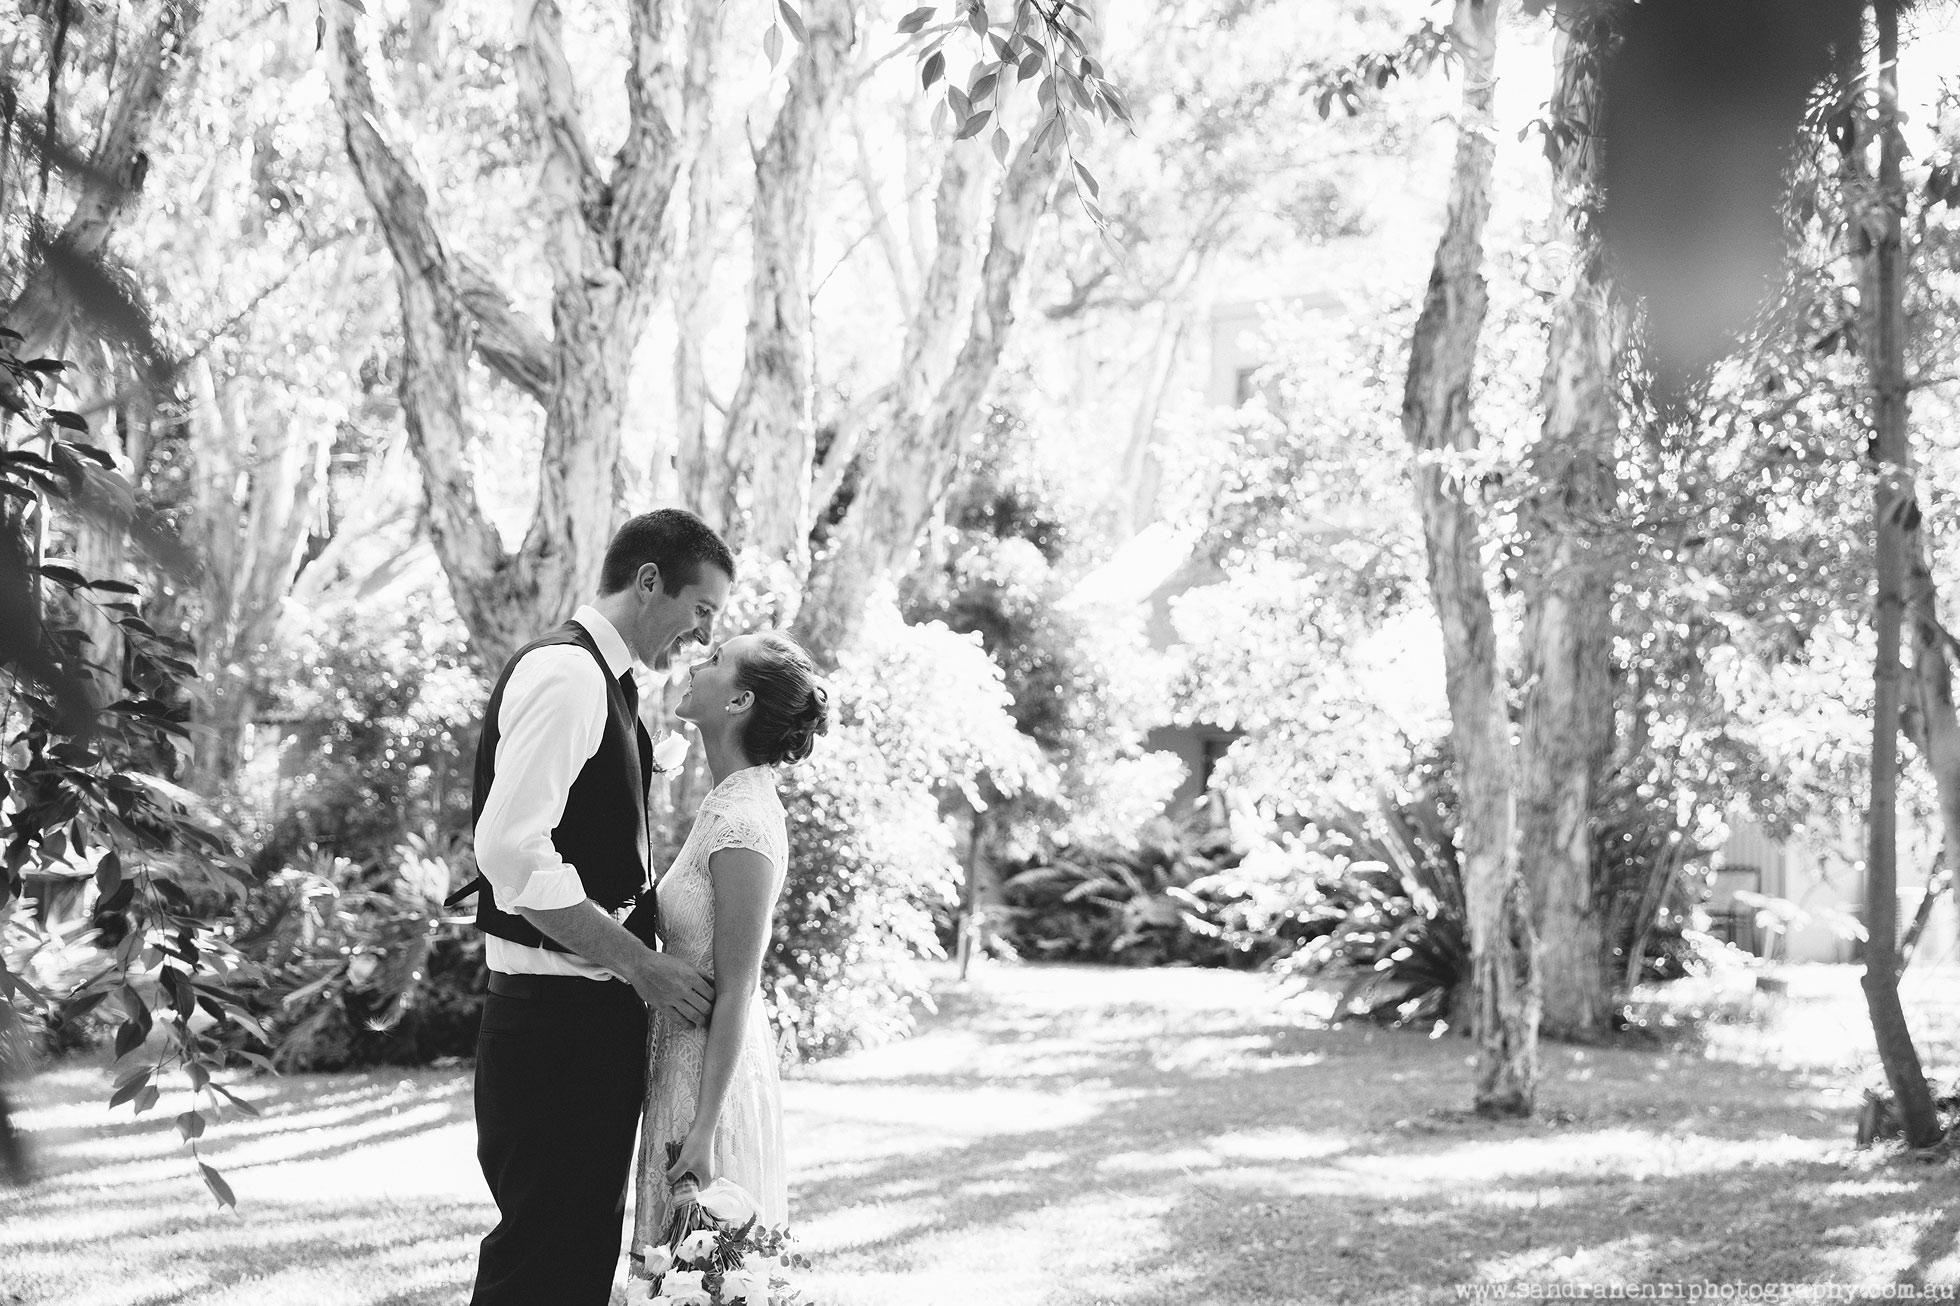 Port-Stephens-Wedding-Photographer-Central-Coast-14.jpg